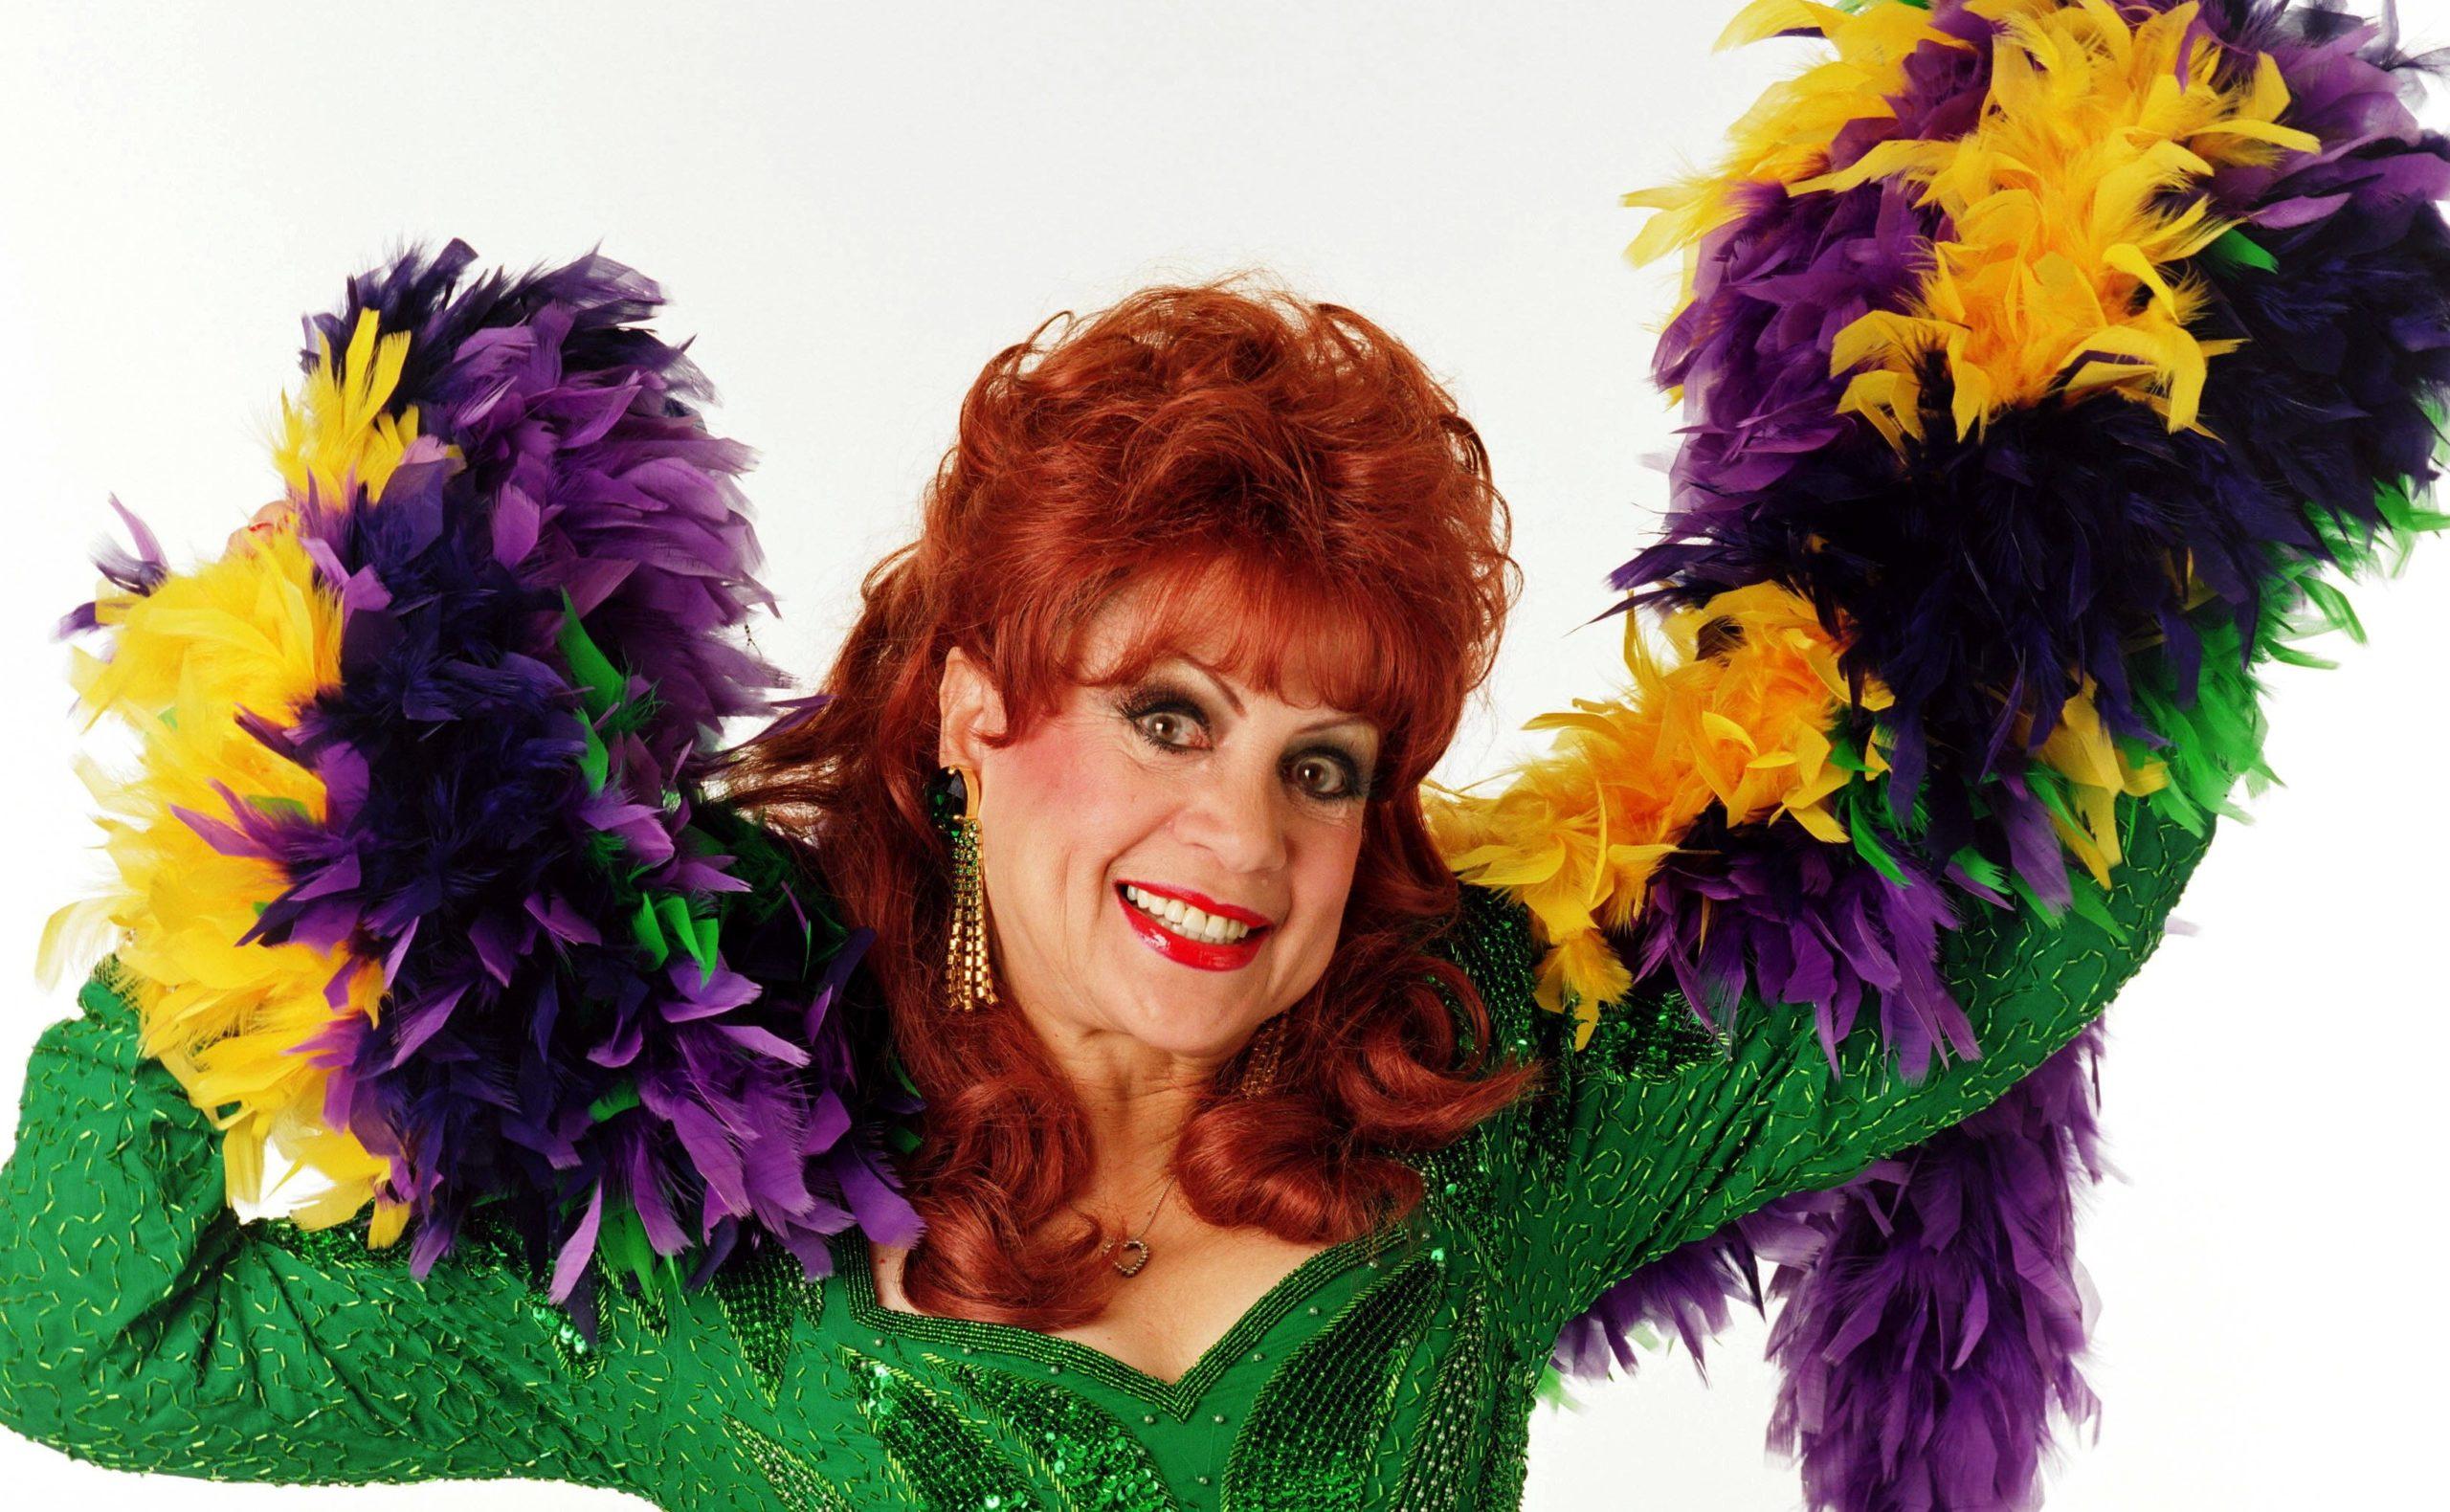 Singer Margarita Pracatan 'dies aged 89'